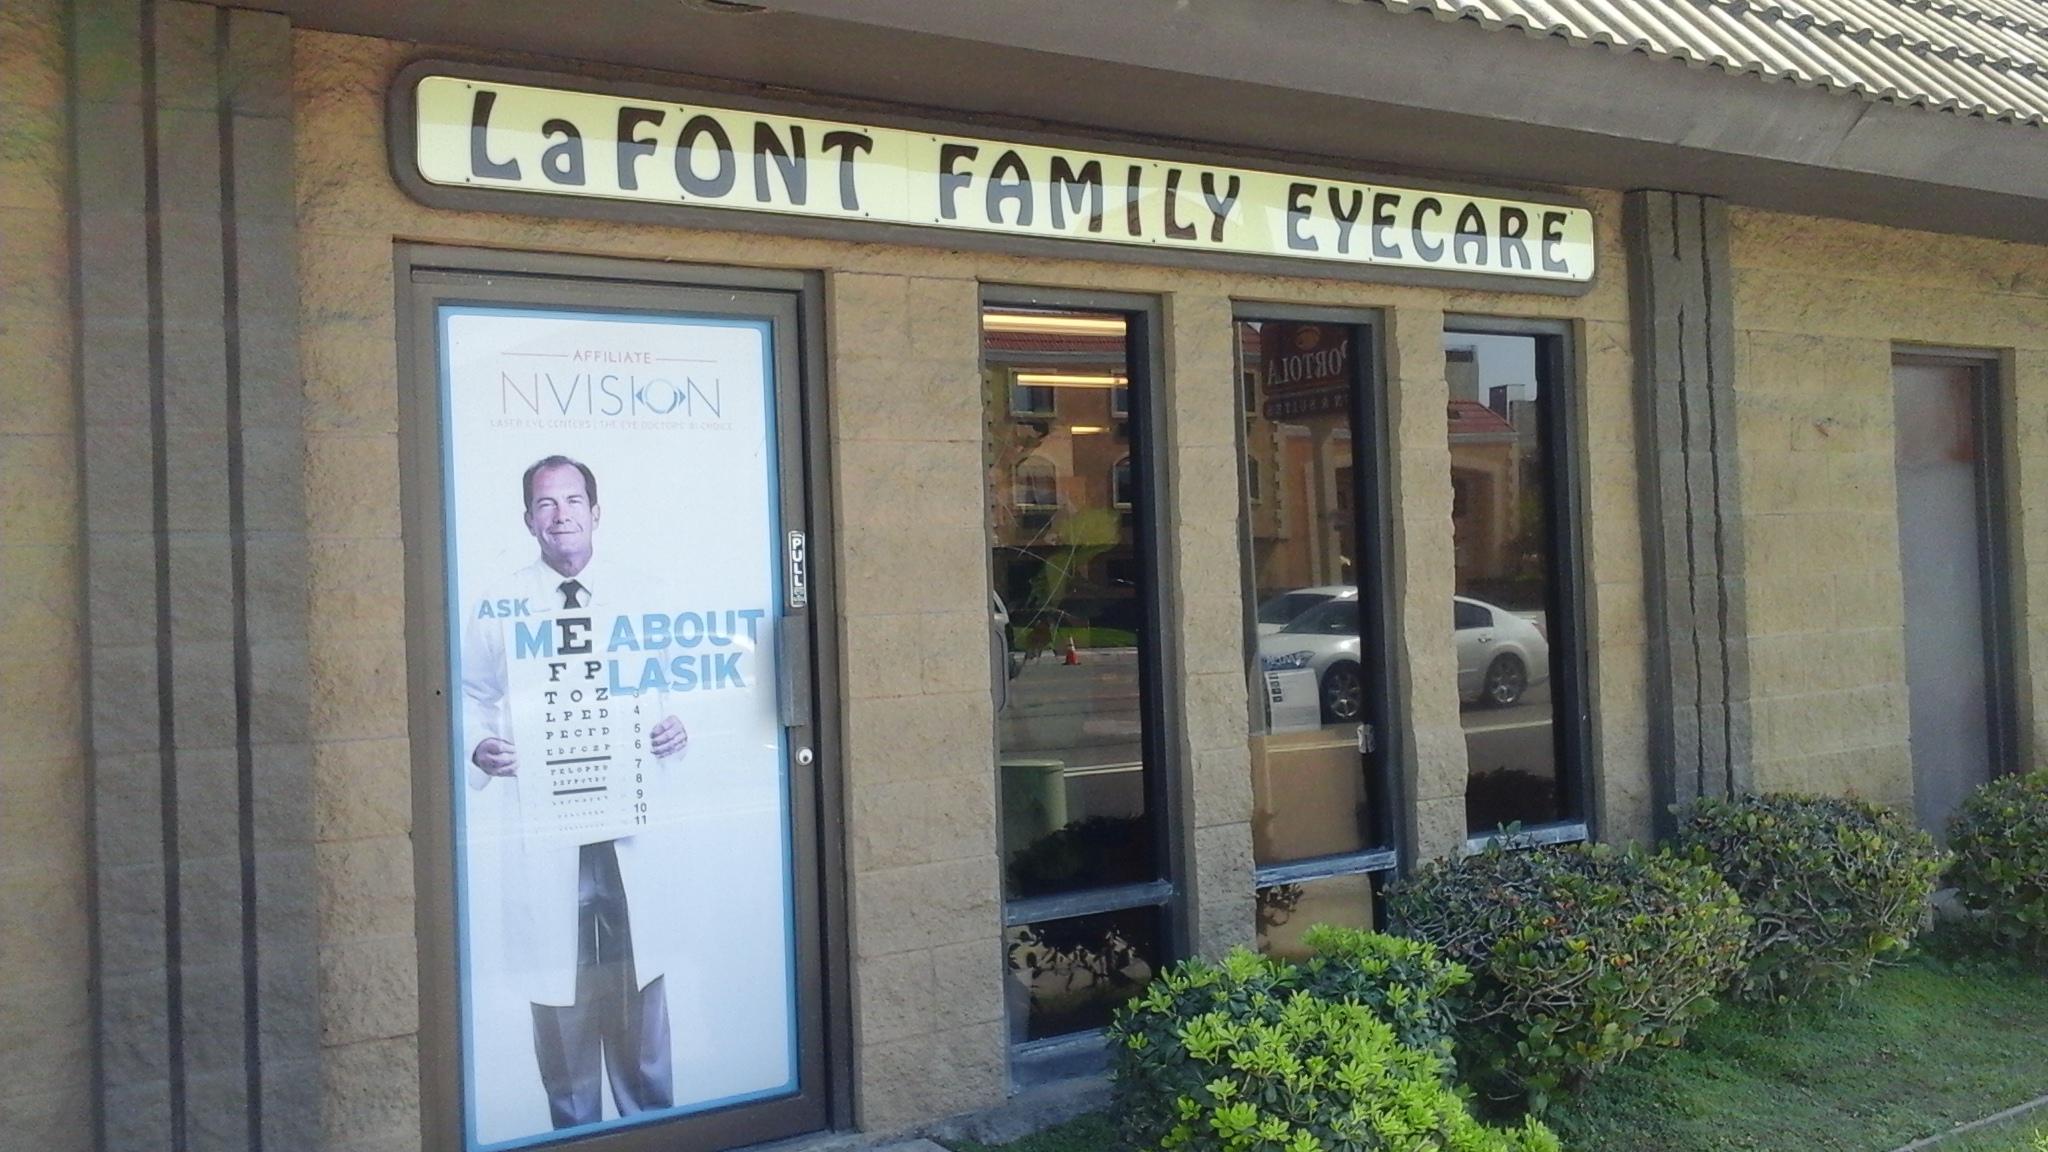 LaFont Family Eyecare Optometry image 3